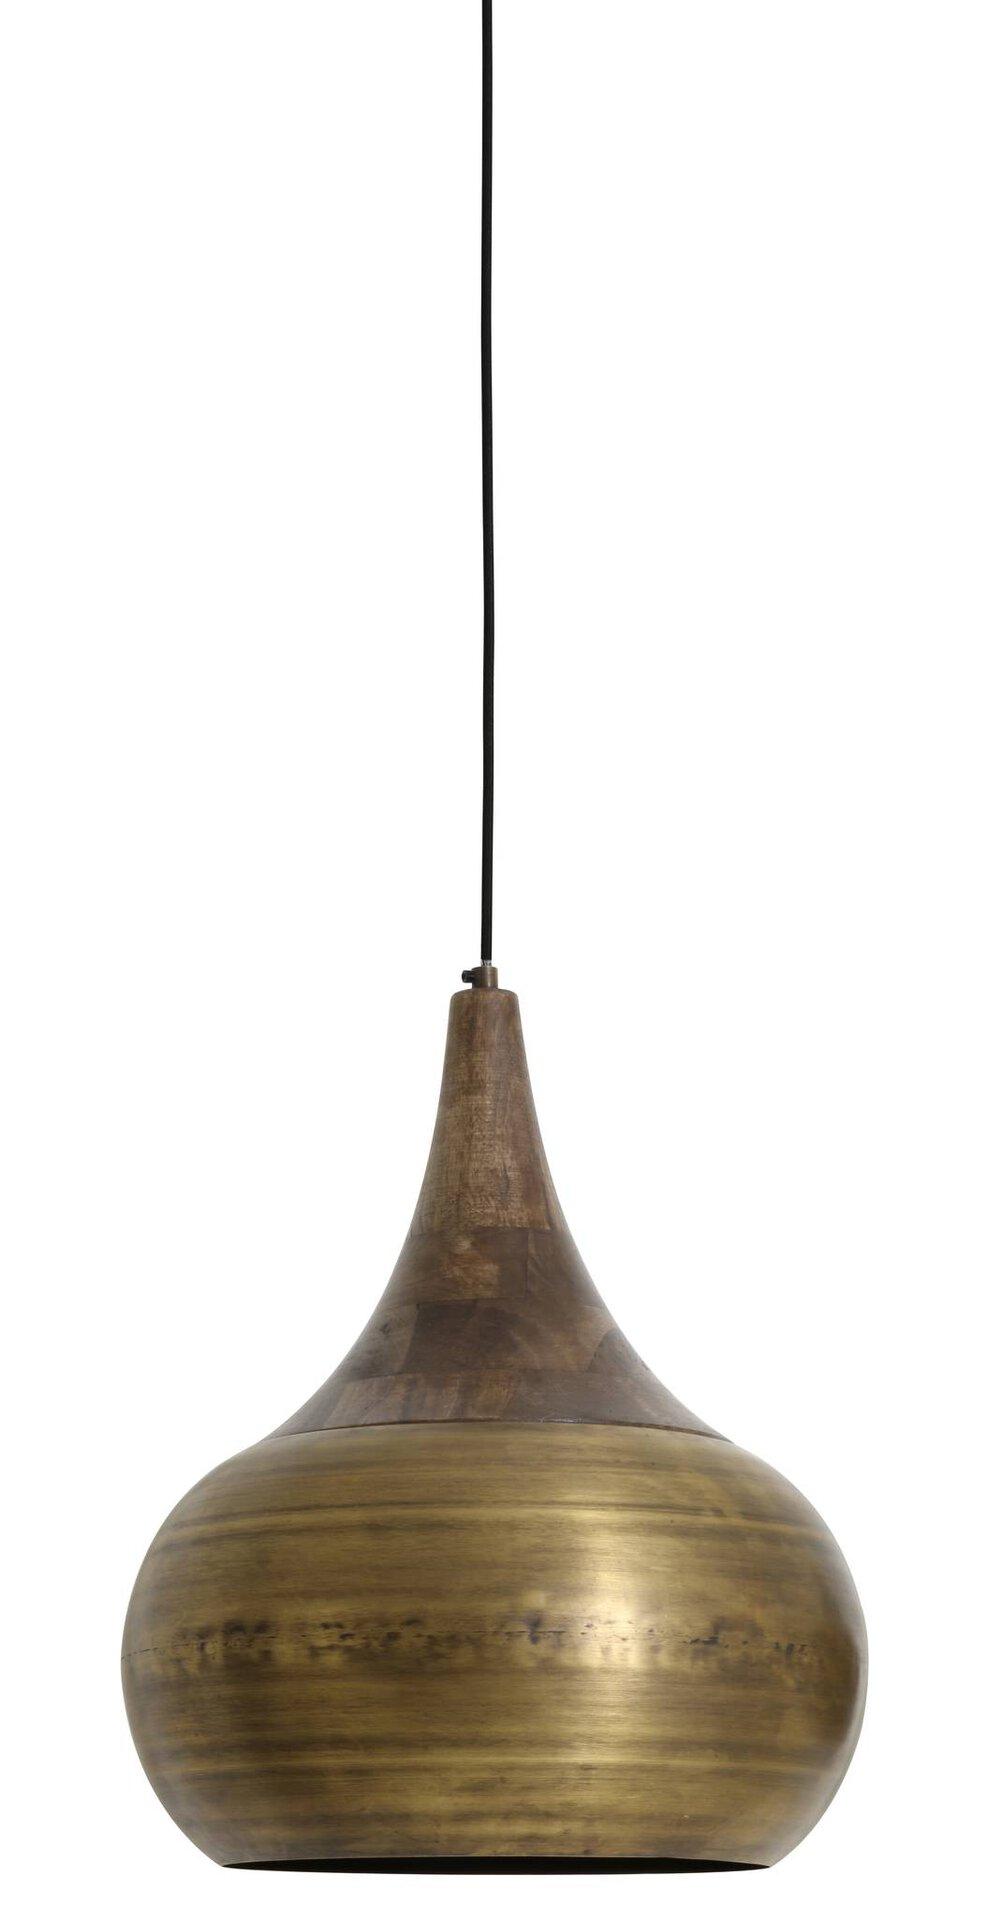 Hängeleuchte SAIDA Light & Living Metall braun 46 x 166 x 35 cm